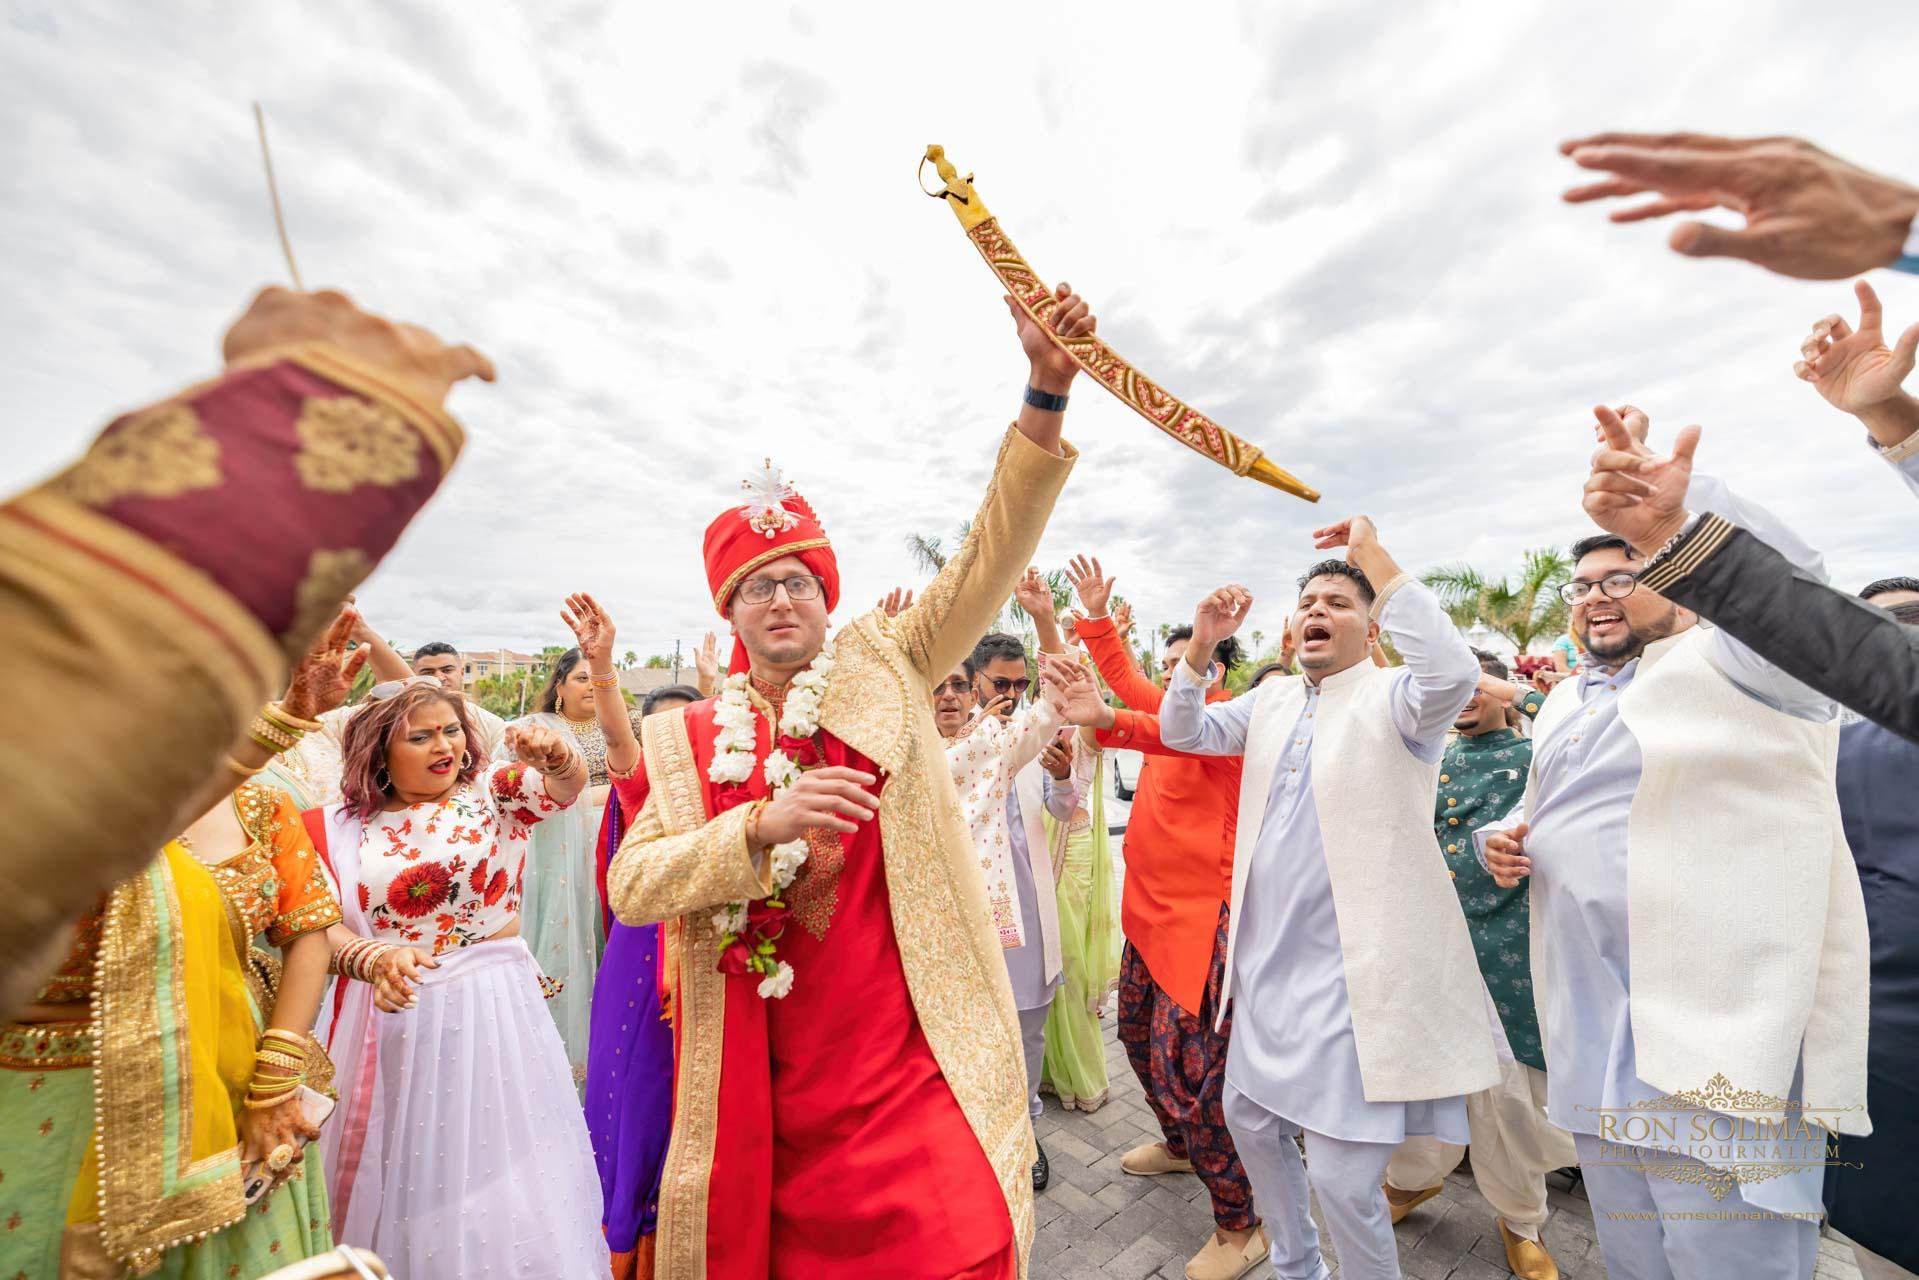 Best Don CeSar Wedding photos